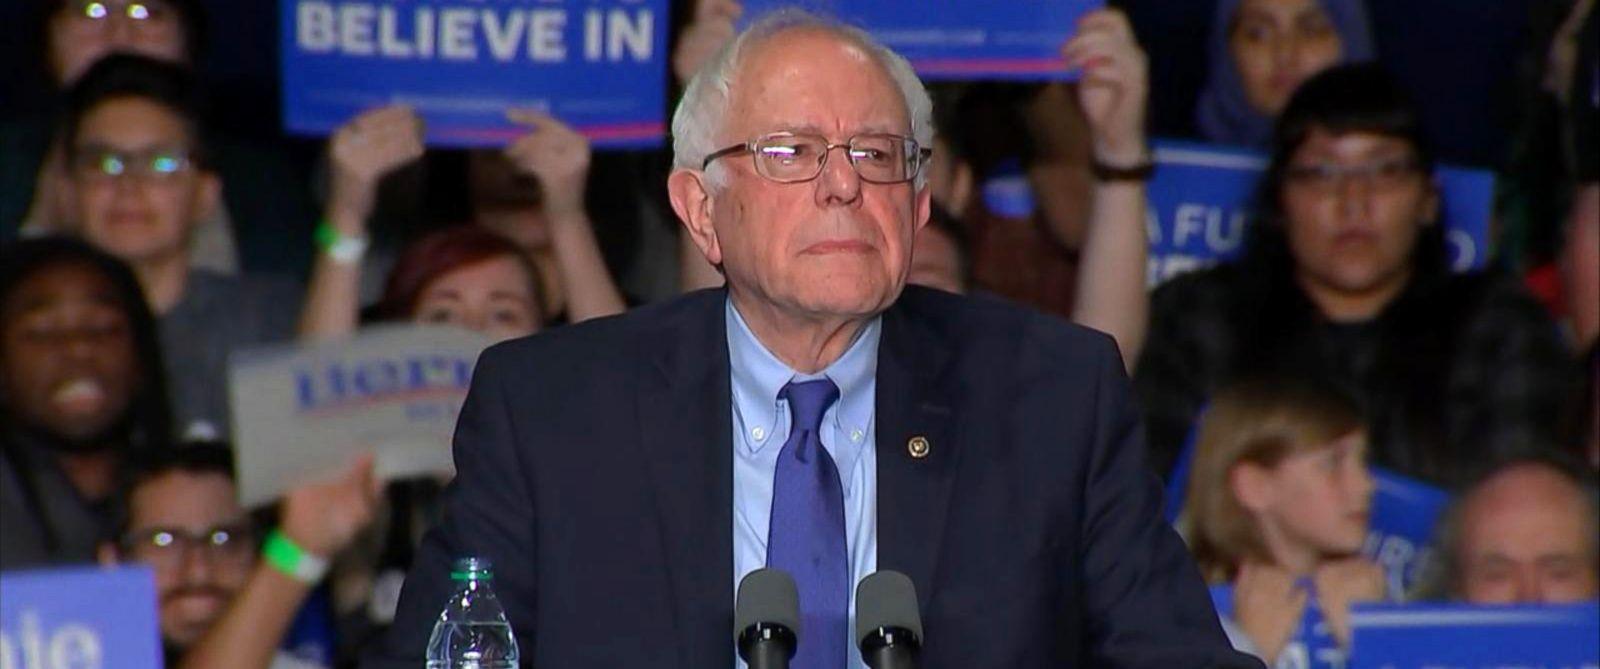 PHOTO: Sen. Bernie Sanders spoke at his primary night event on March 15, 2016, in Phoenix.